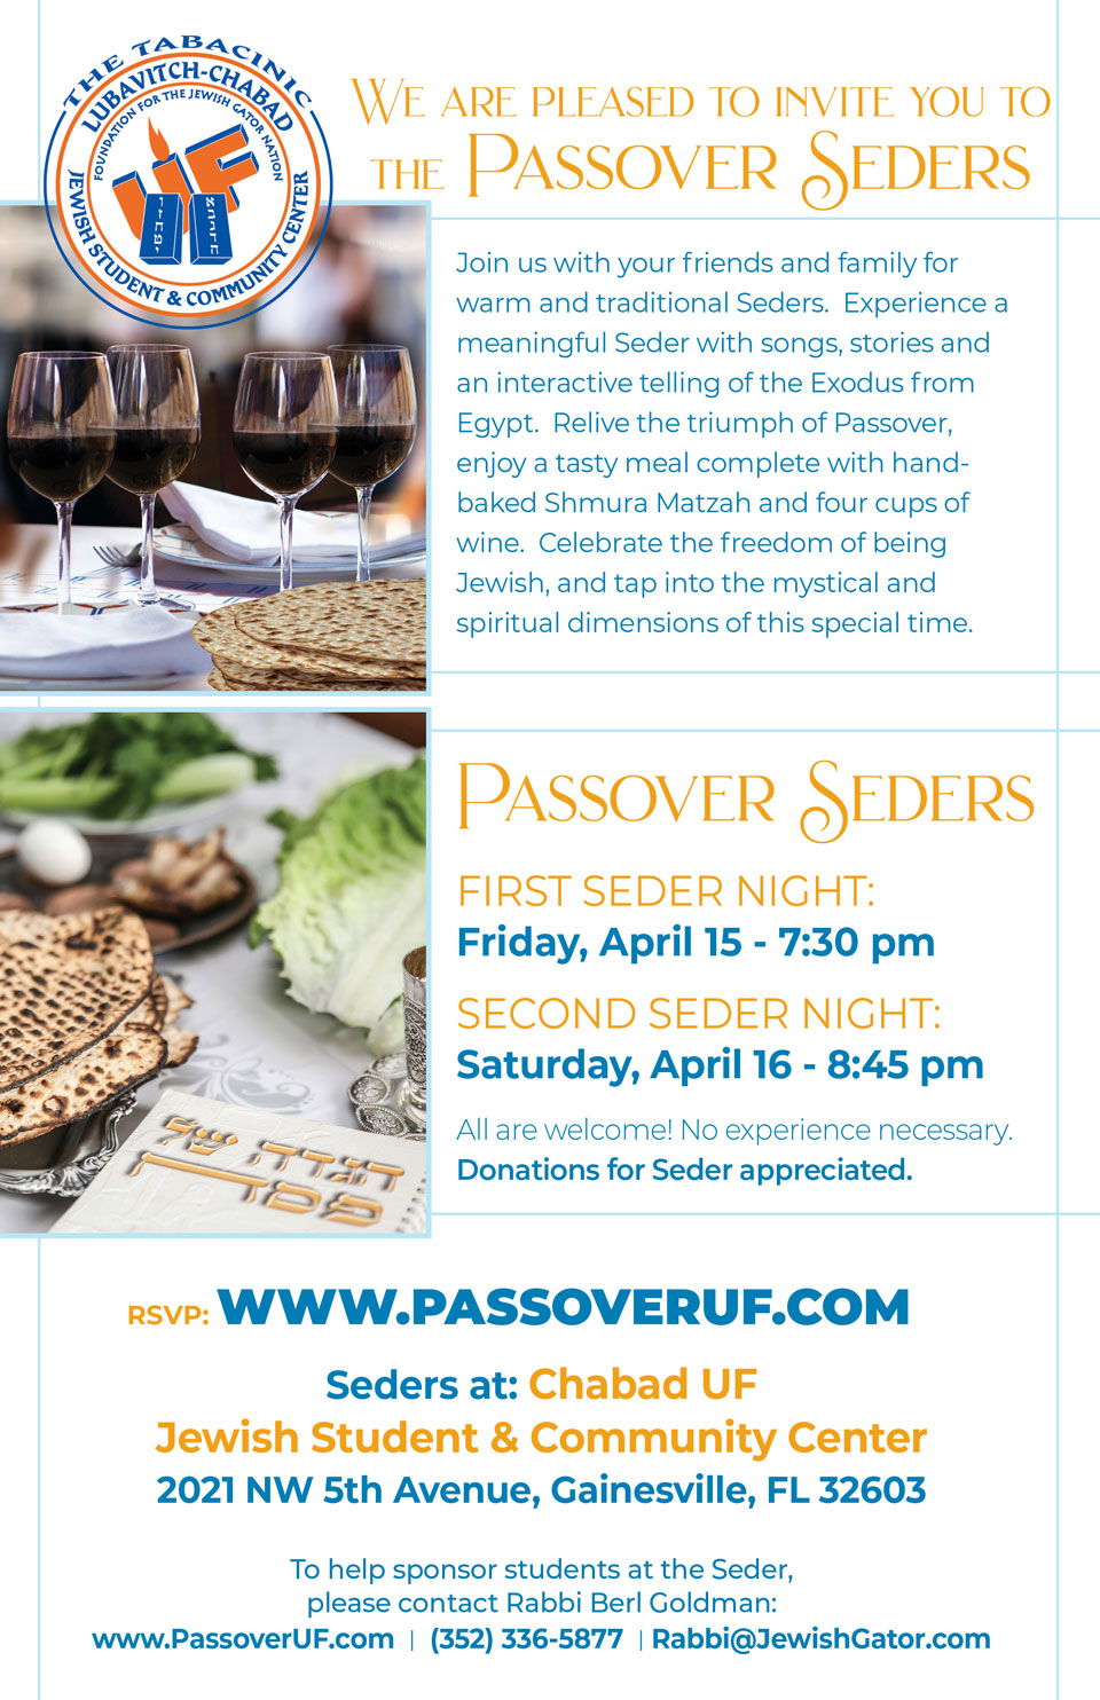 Passover Seder's